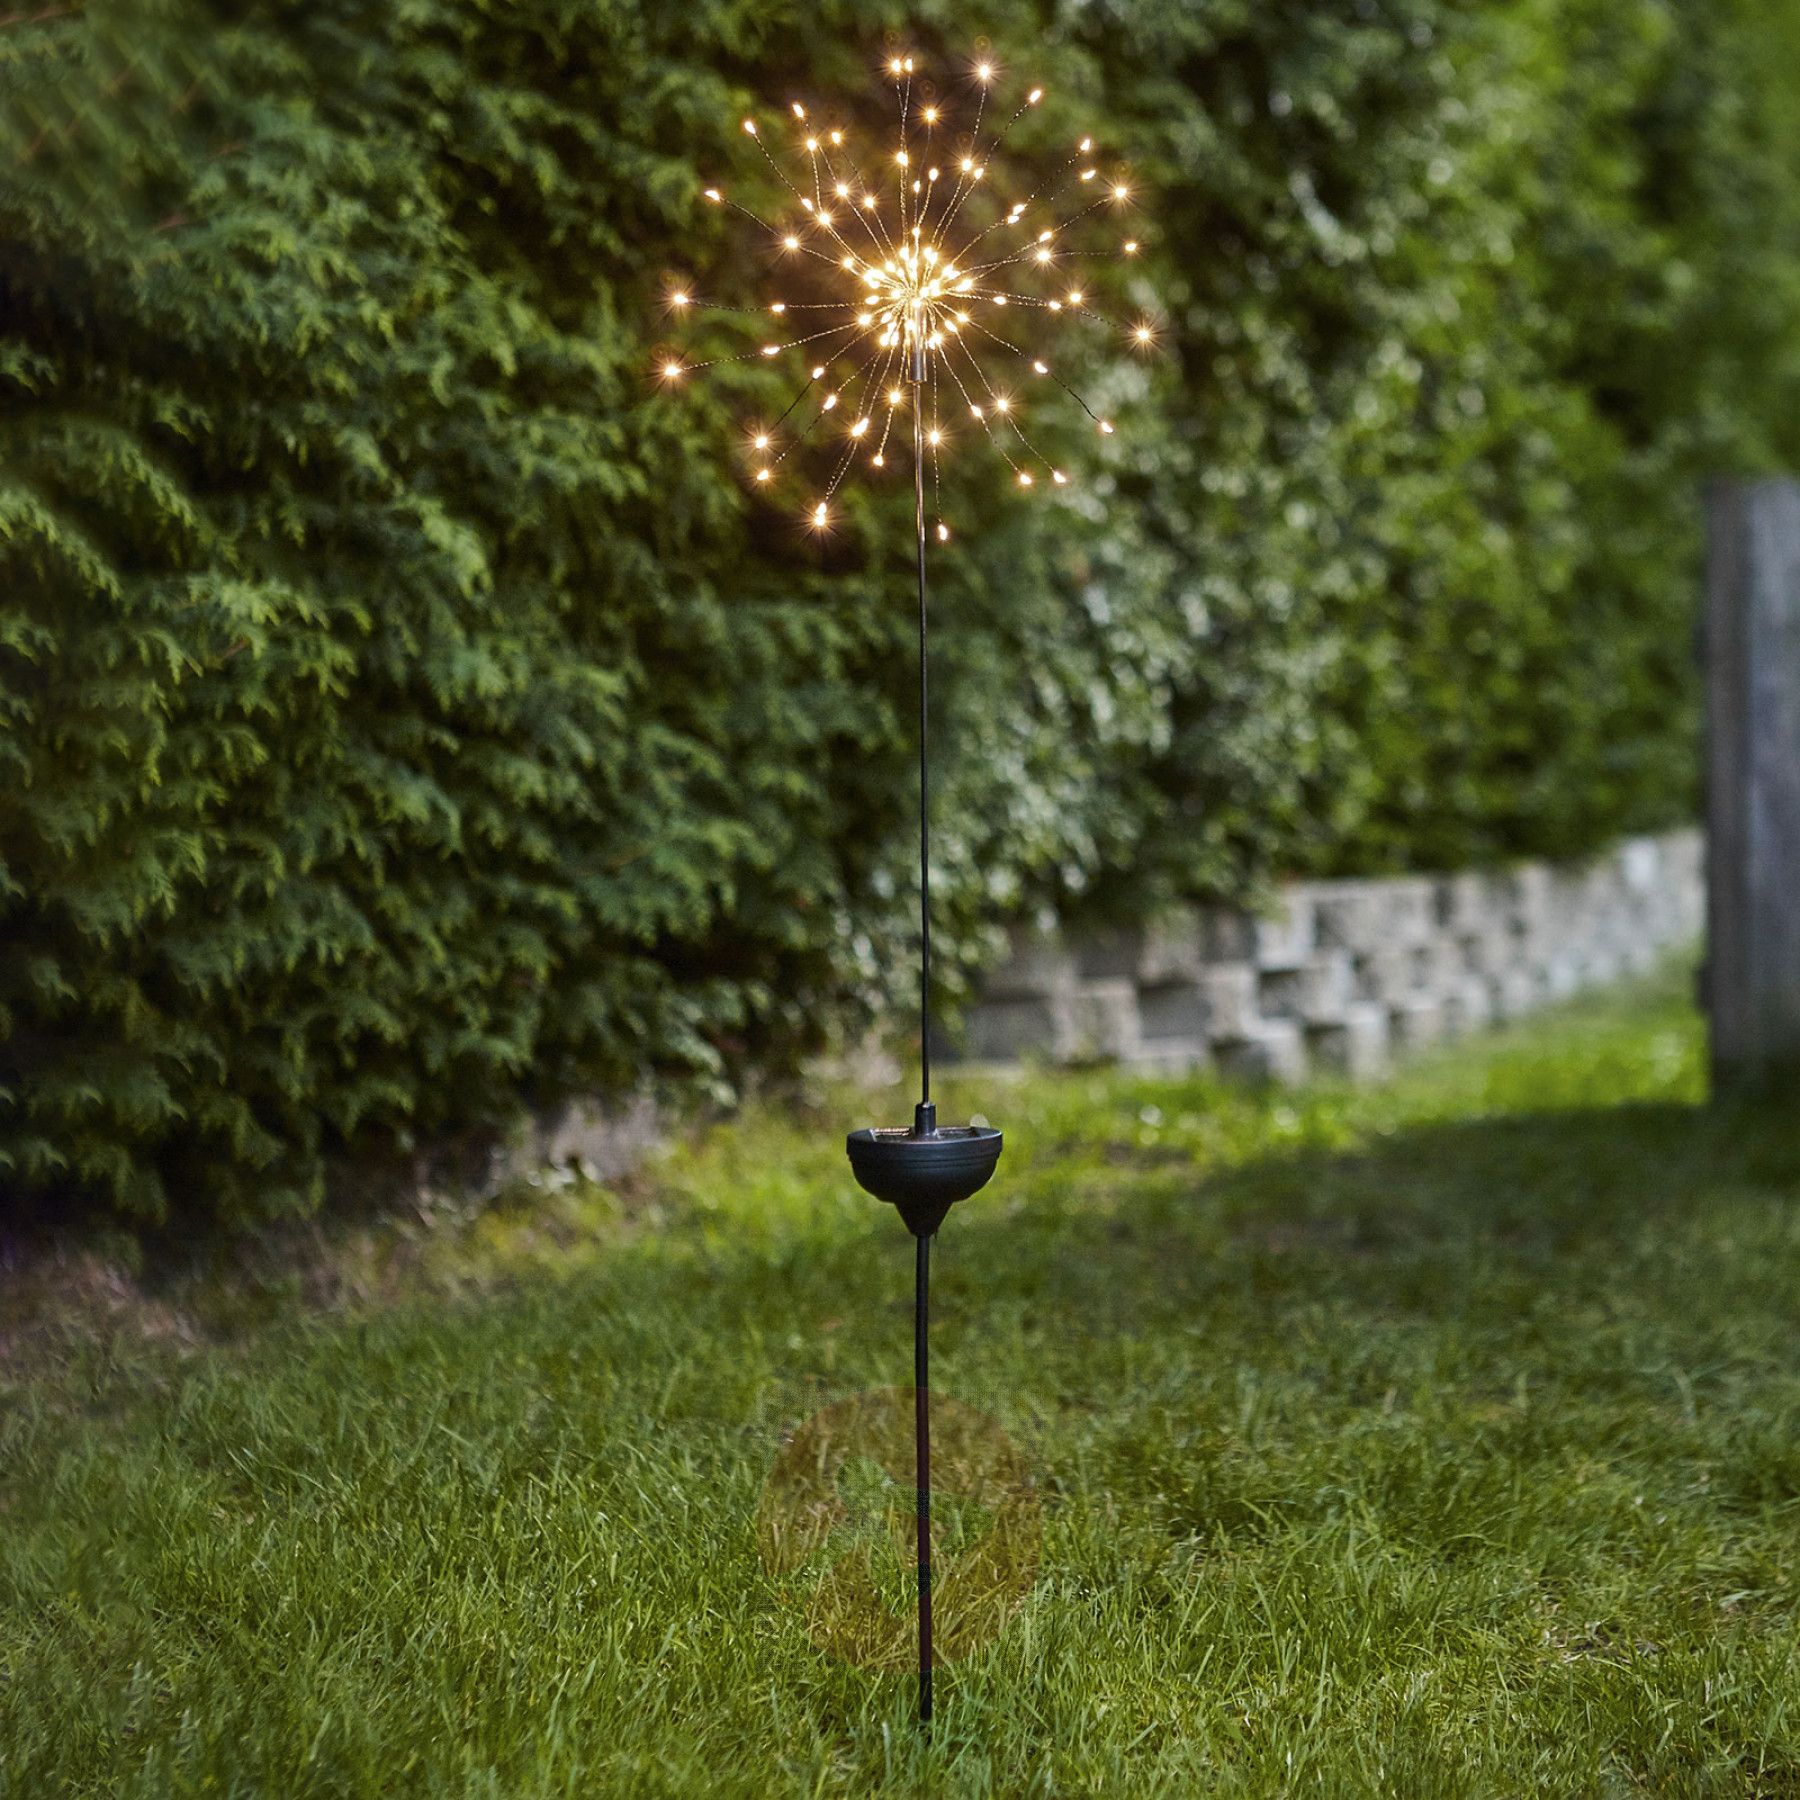 Led Solarleuchte Firework Mit Erdspiess Led Solarleuchte Solarleuchten Solar Lichterkette